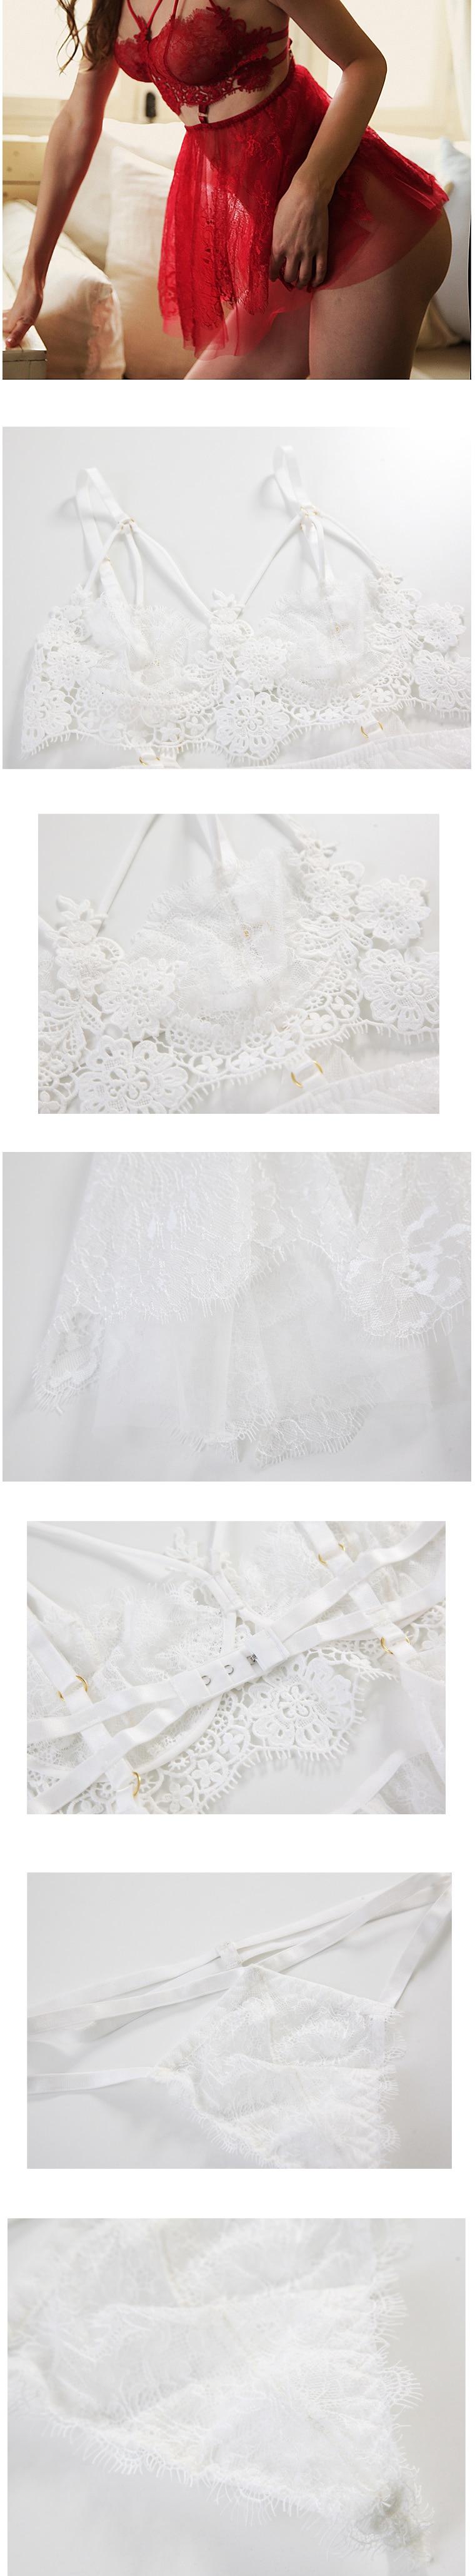 White Angel Sexy Dress